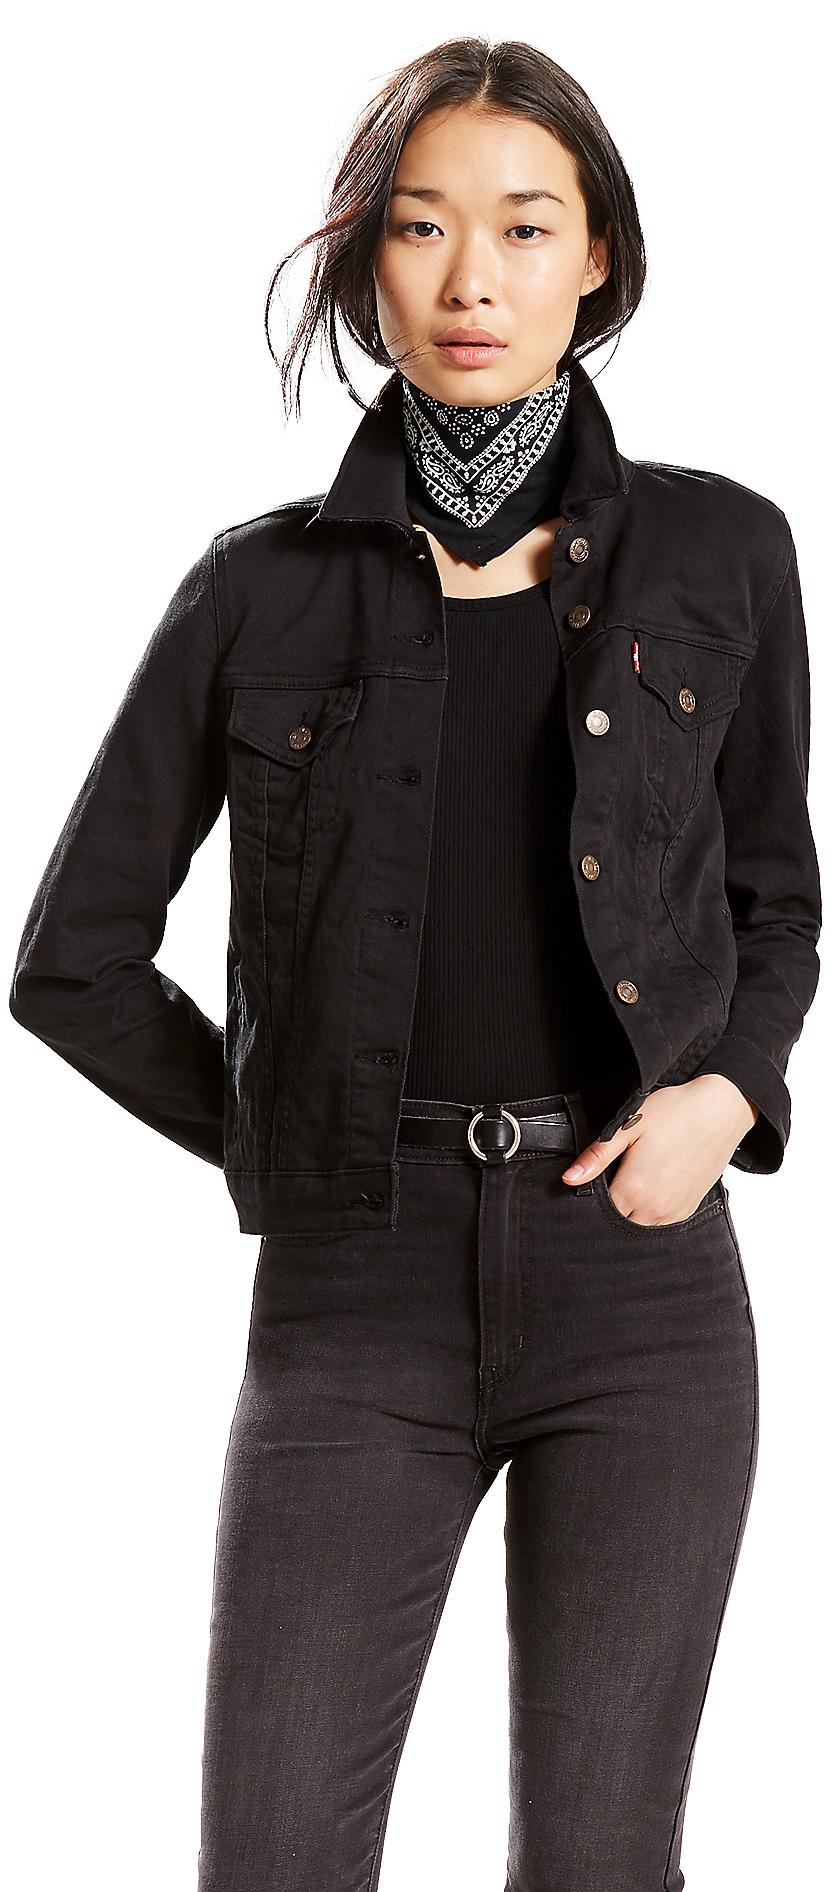 catalog gallery barn coats jsp s outerwear alt jackets kohl barns womens clothing